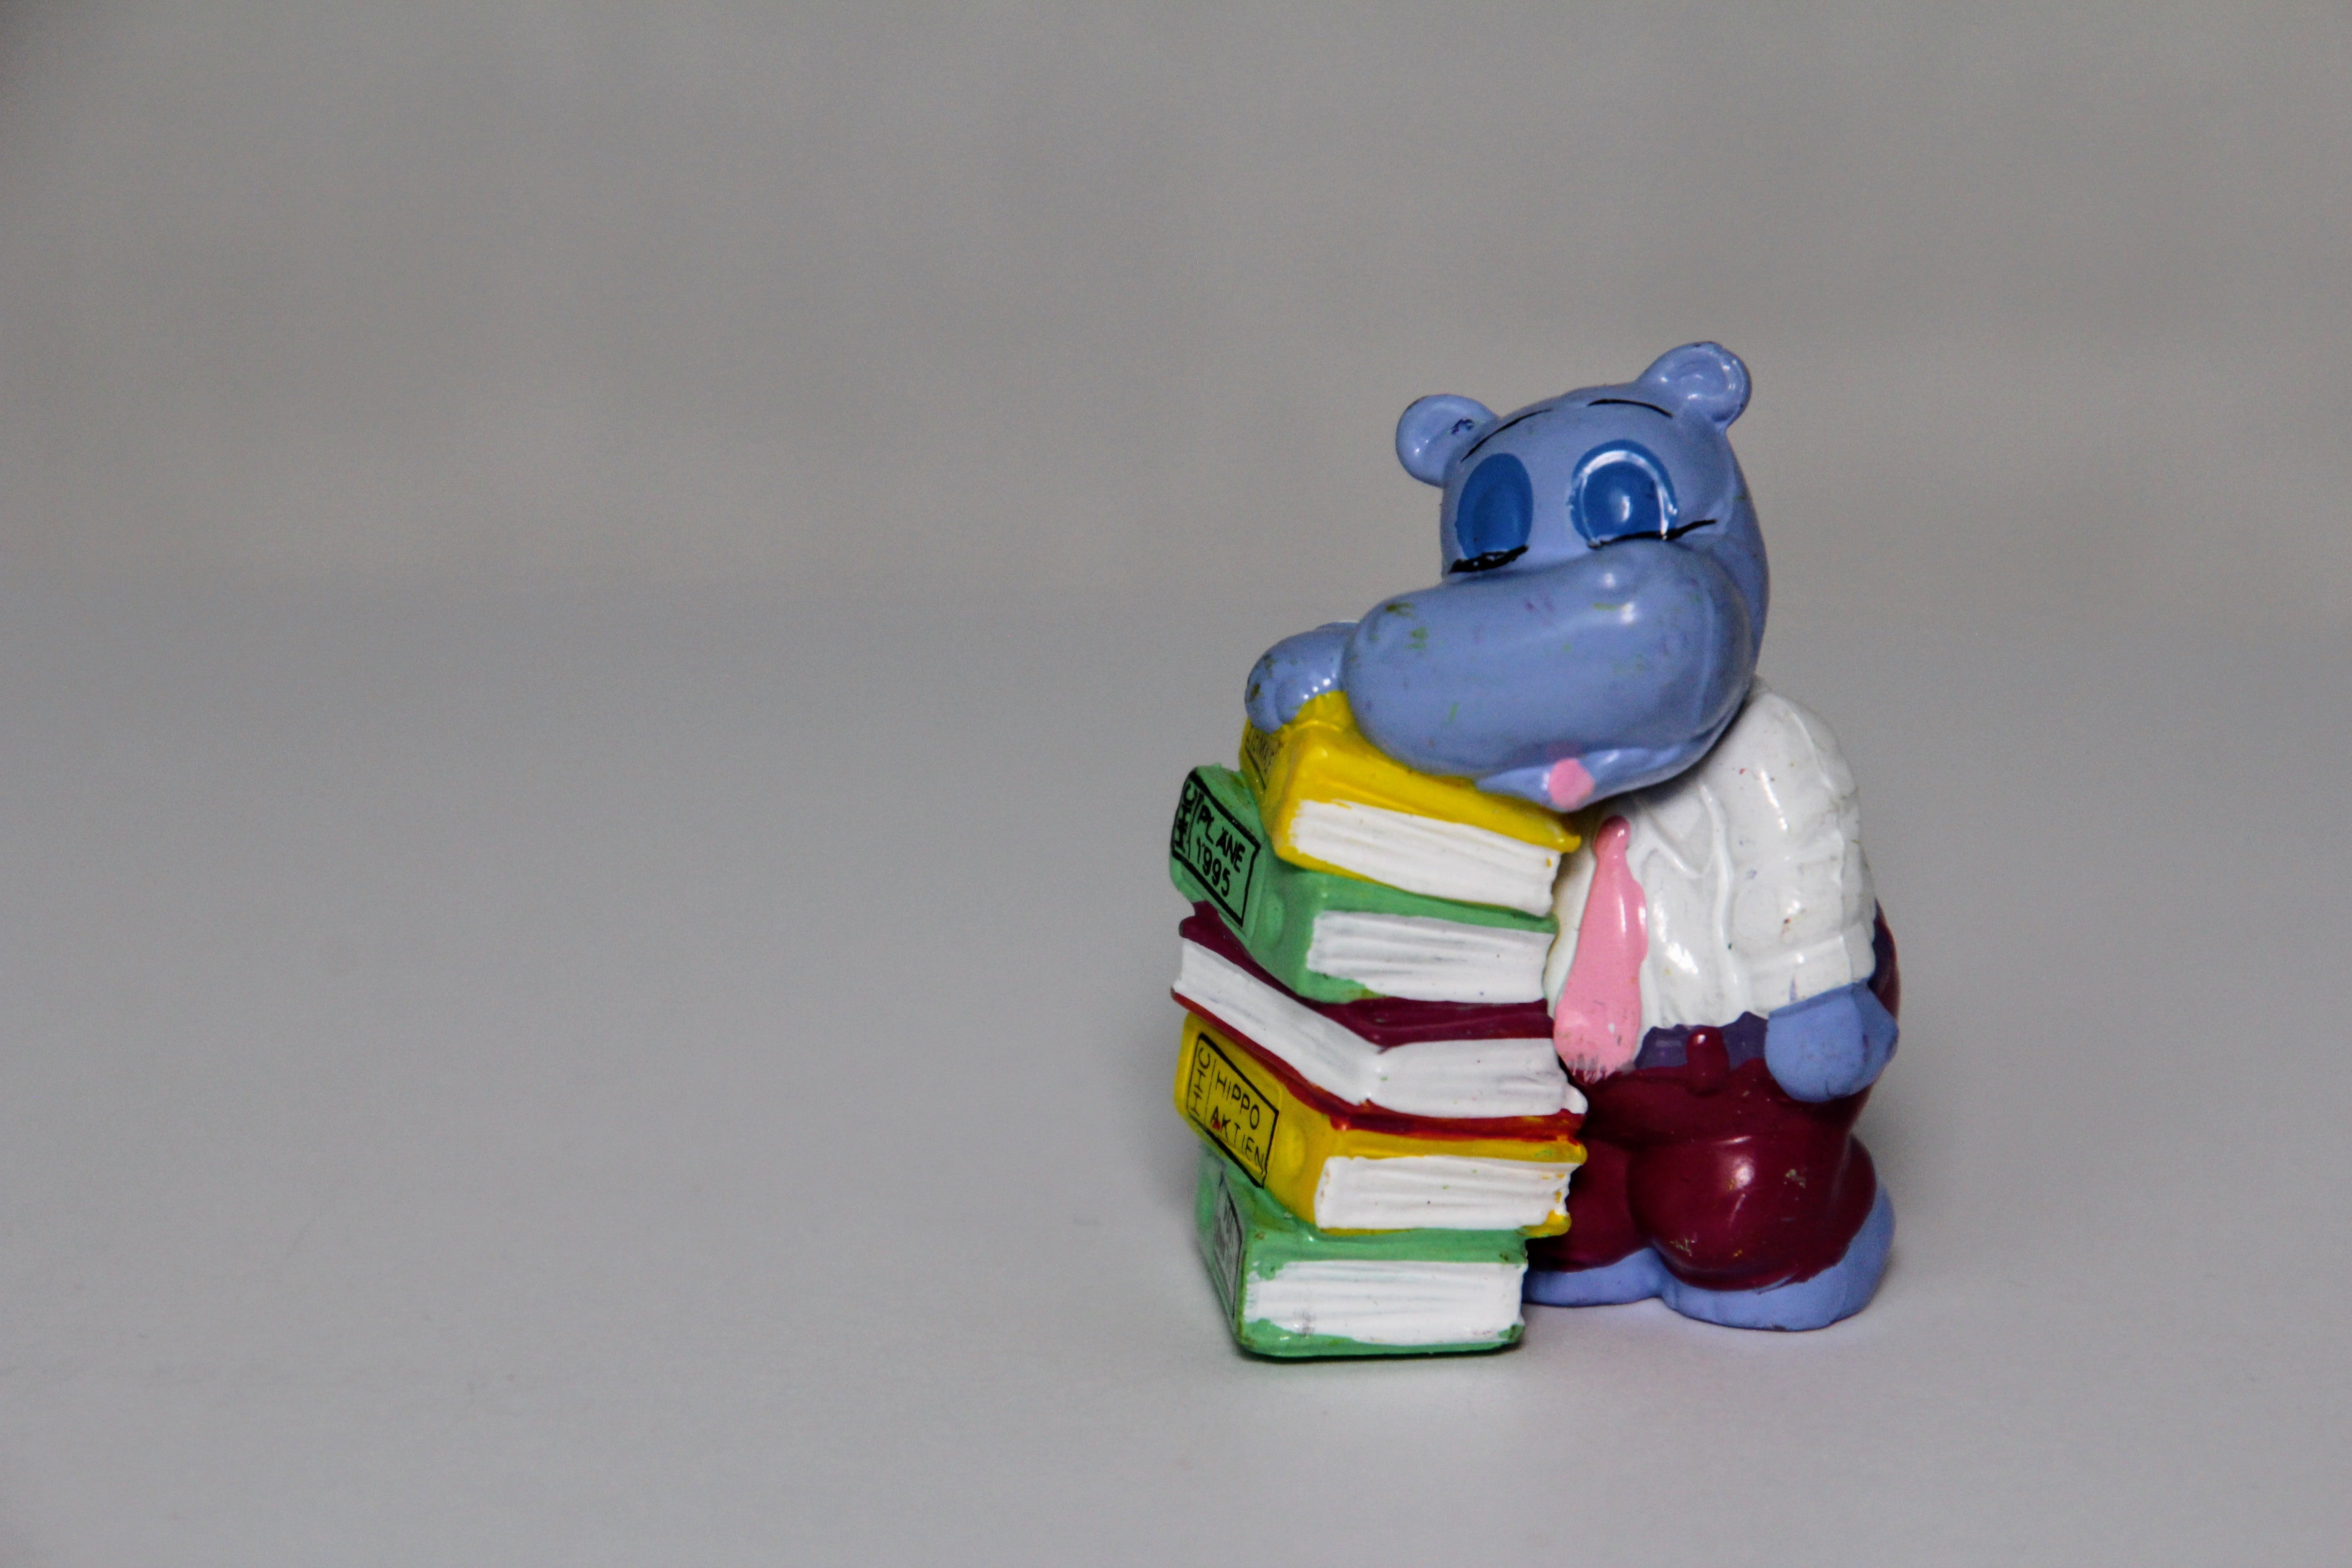 Free stock photo of books, stack, exhausted, überraschungseifiguren